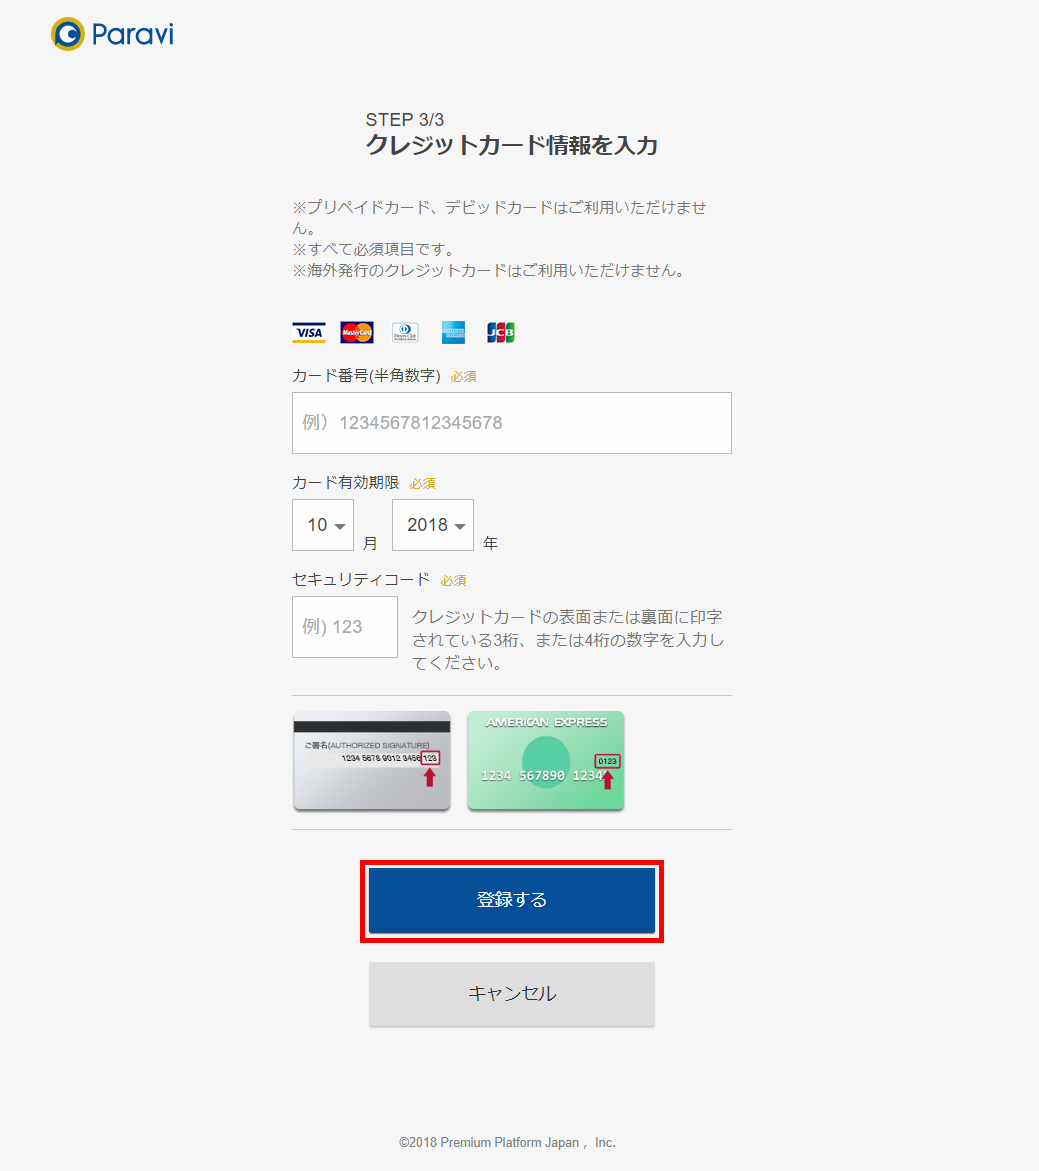 Paravi_クレジットカード情報を入力